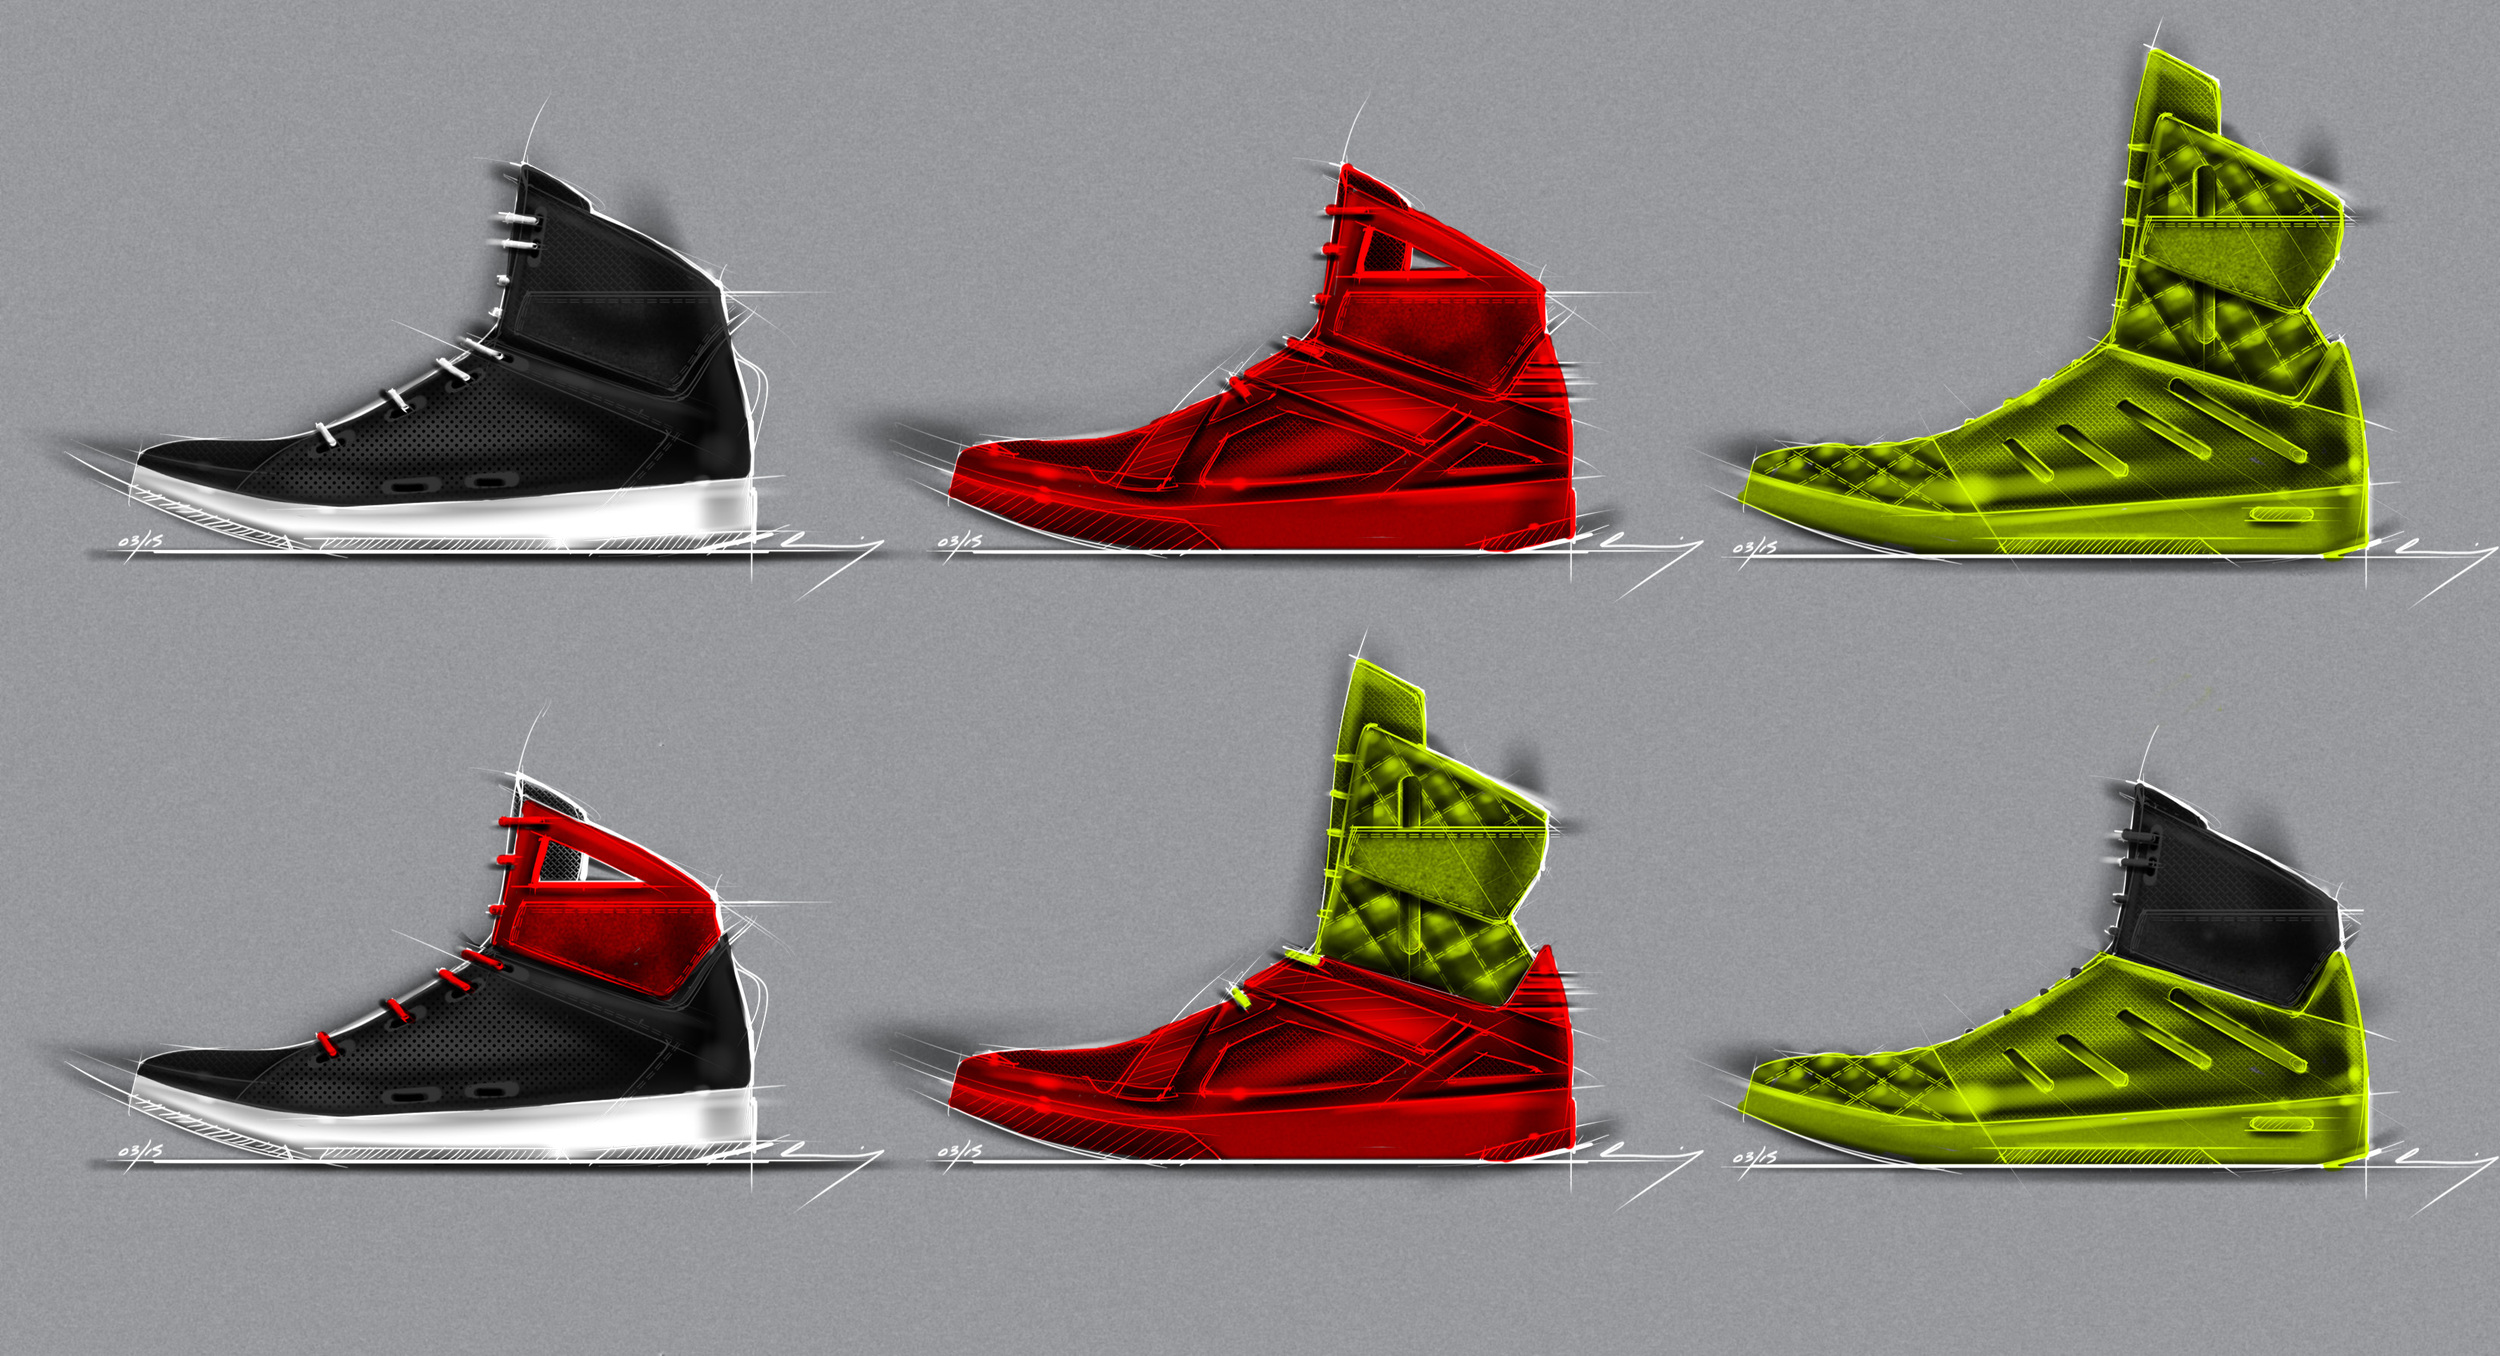 miix_concept_design_sketch_colorway-mix_01.jpg